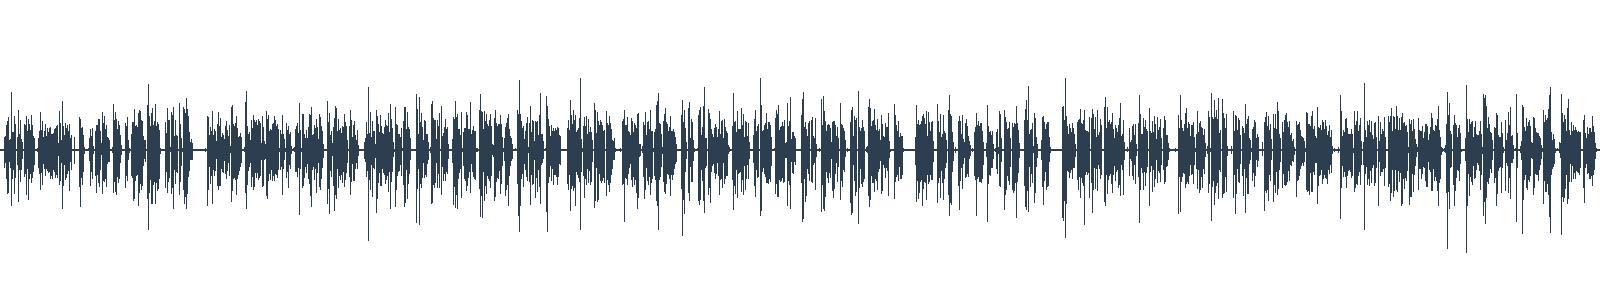 Denis McBride: Putovanie s Jonášom (2) waveform